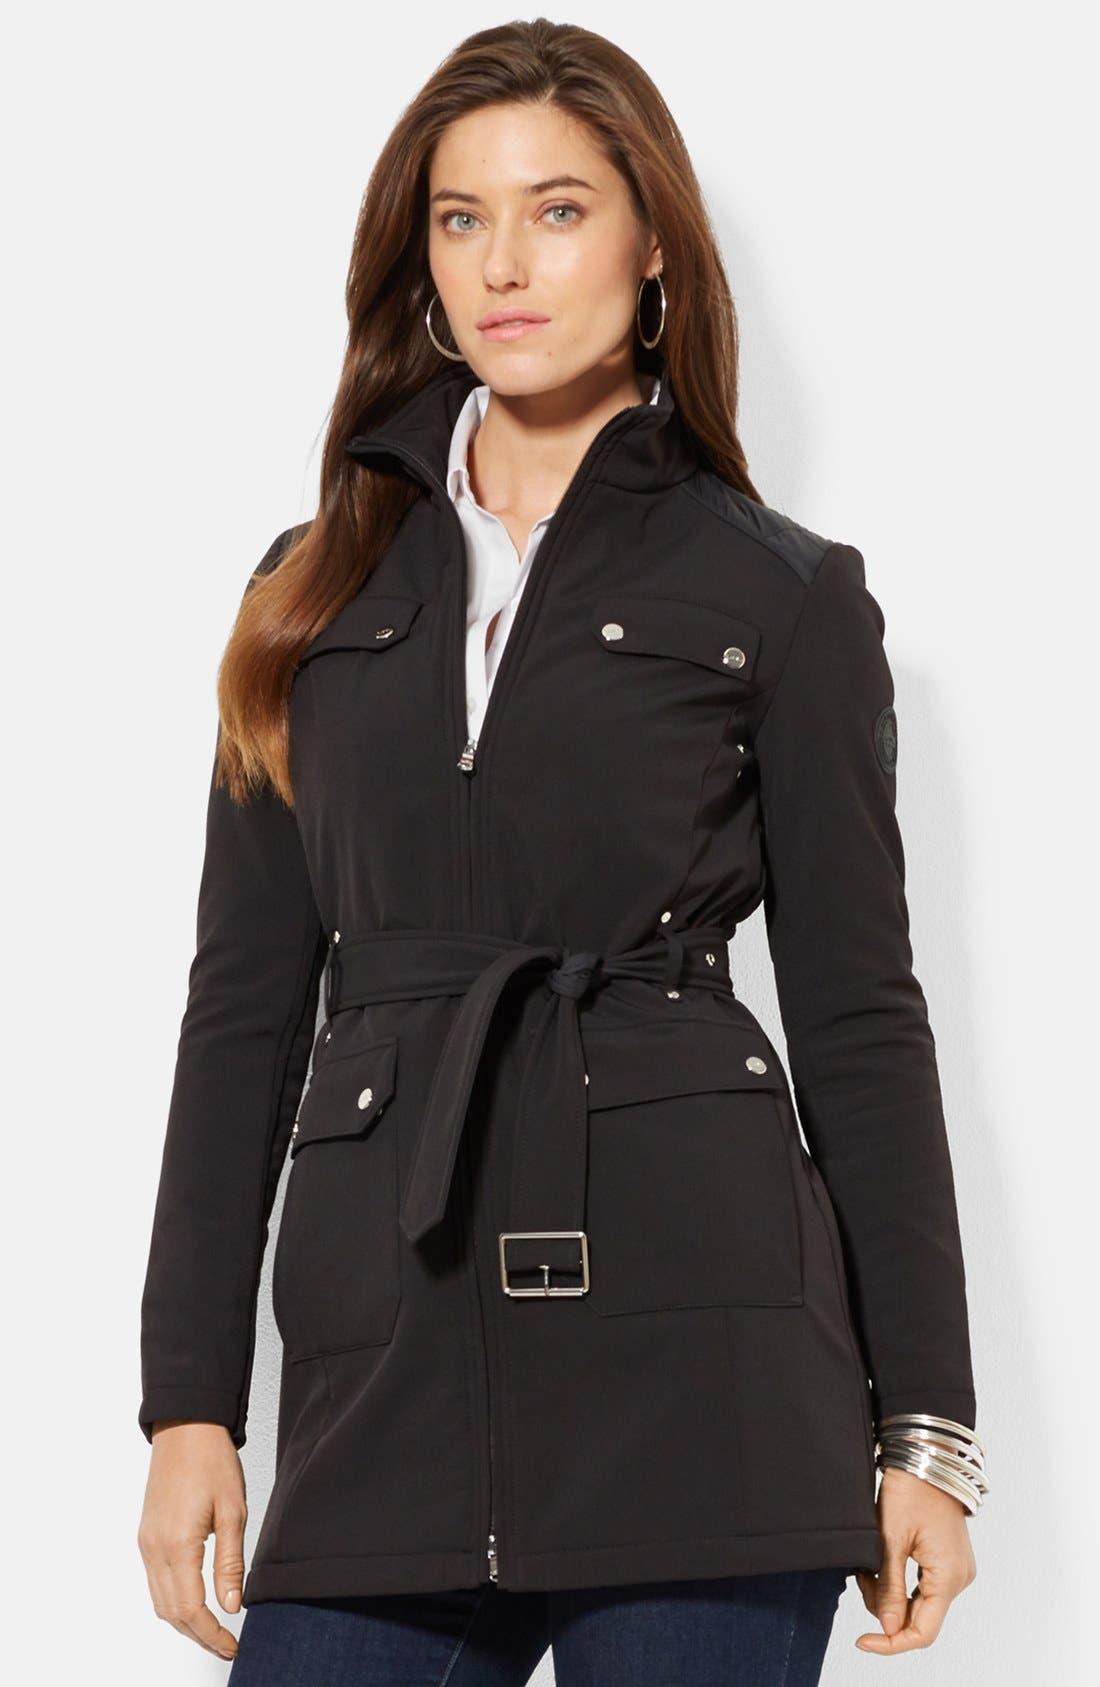 Alternate Image 1 Selected - Lauren Ralph Lauren Belted Soft Shell Jacket (Online Only)